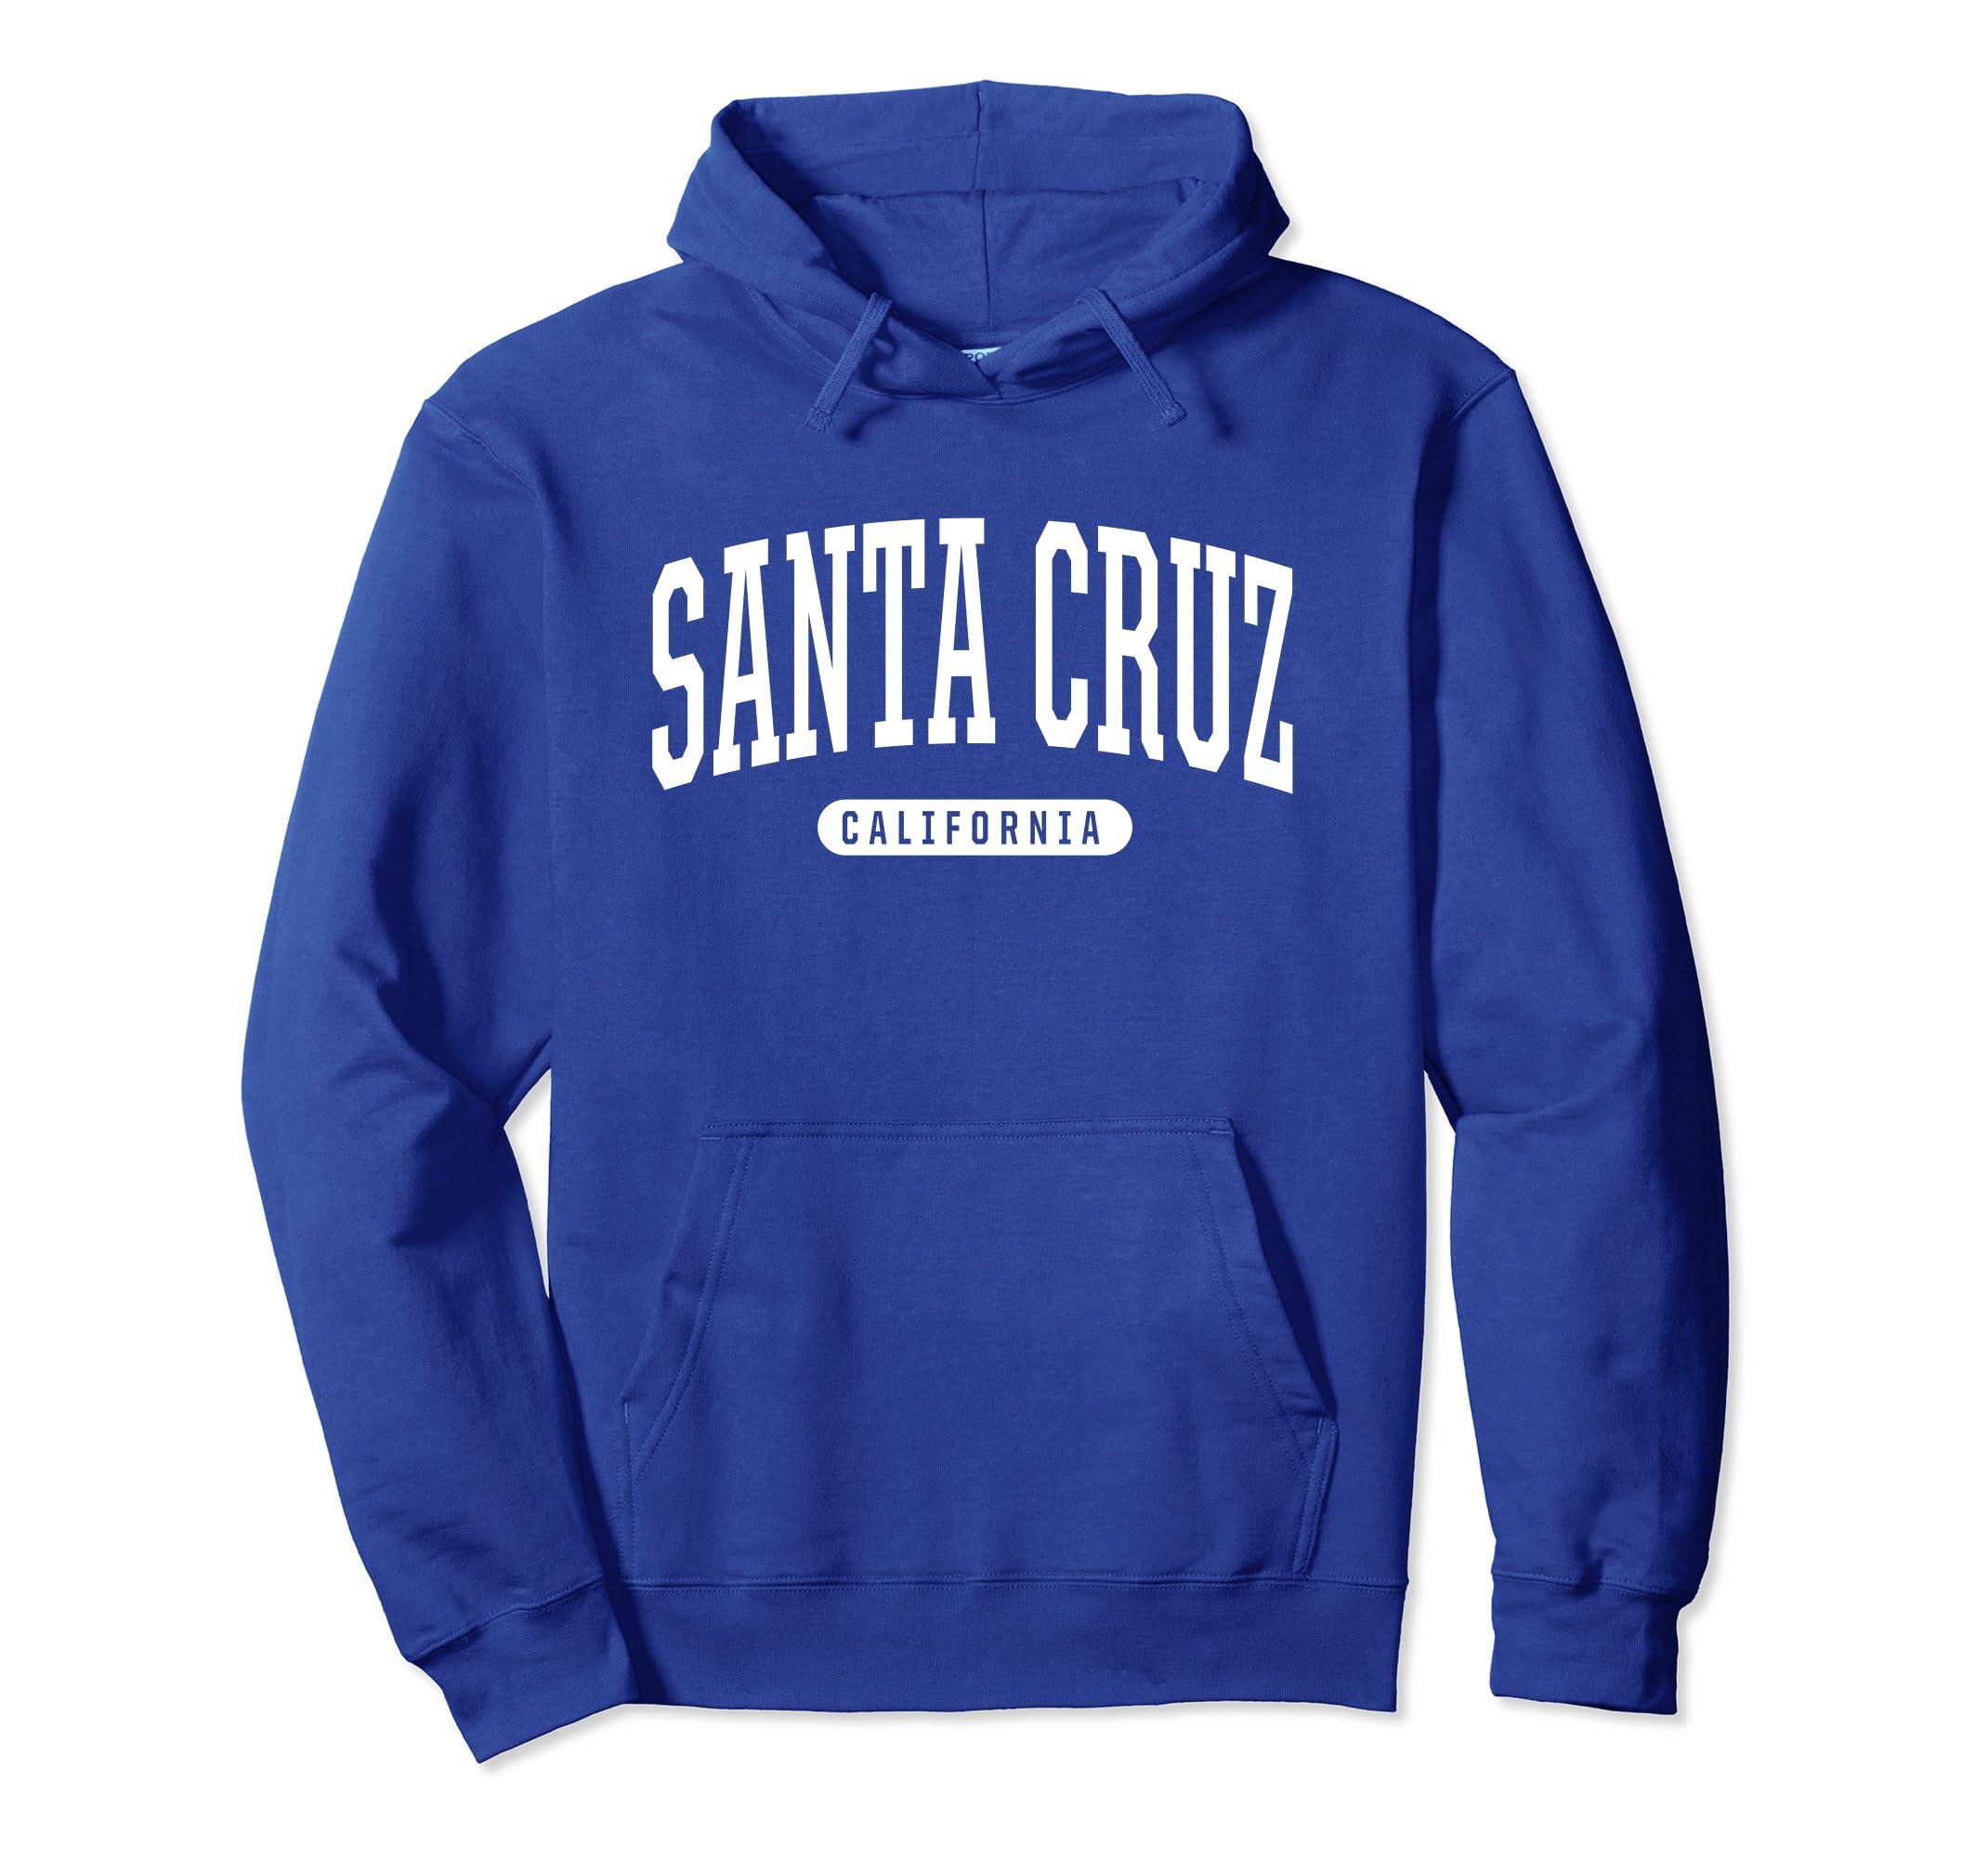 27d30be9 Amazon.com: Santa Cruz Hoodie Sweatshirt College University Style CA USA:  Clothing